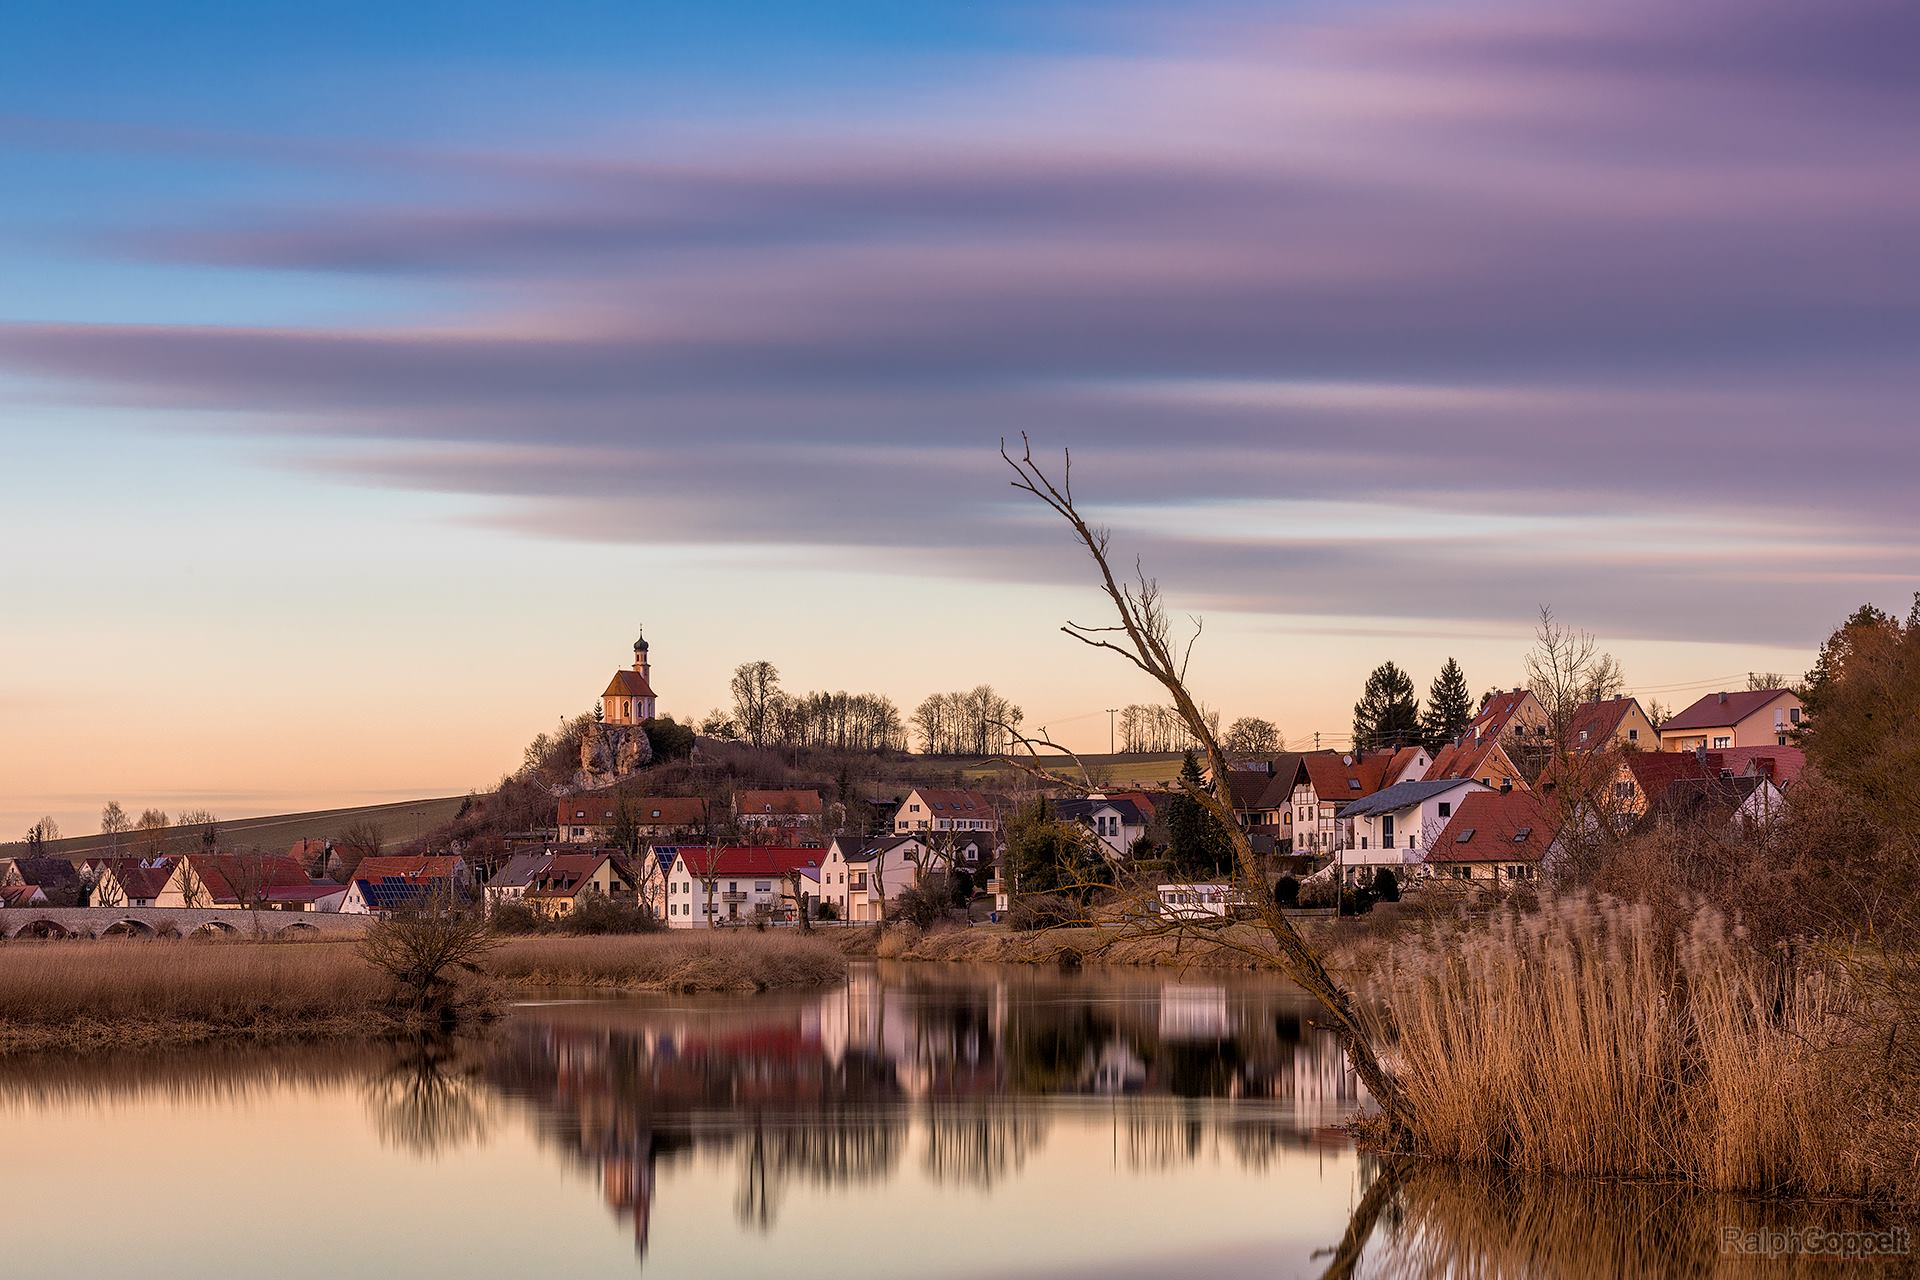 Sunset at Woernitzstein, Germany